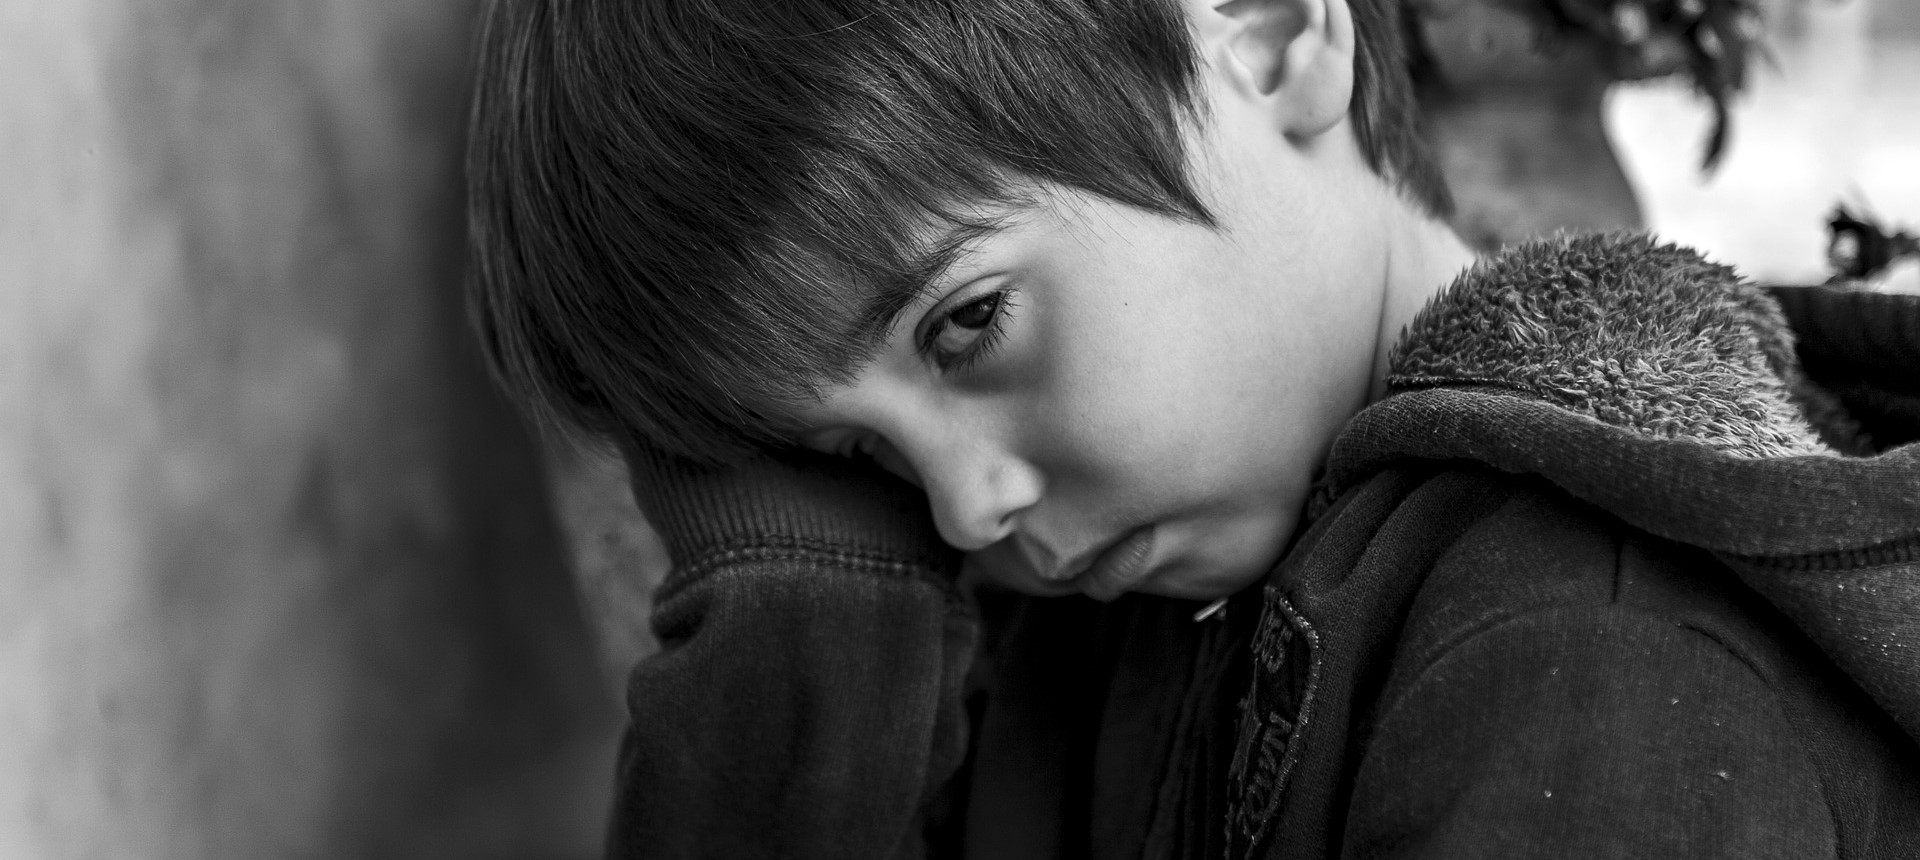 Gloomy Little Boy | Kids Car Donations